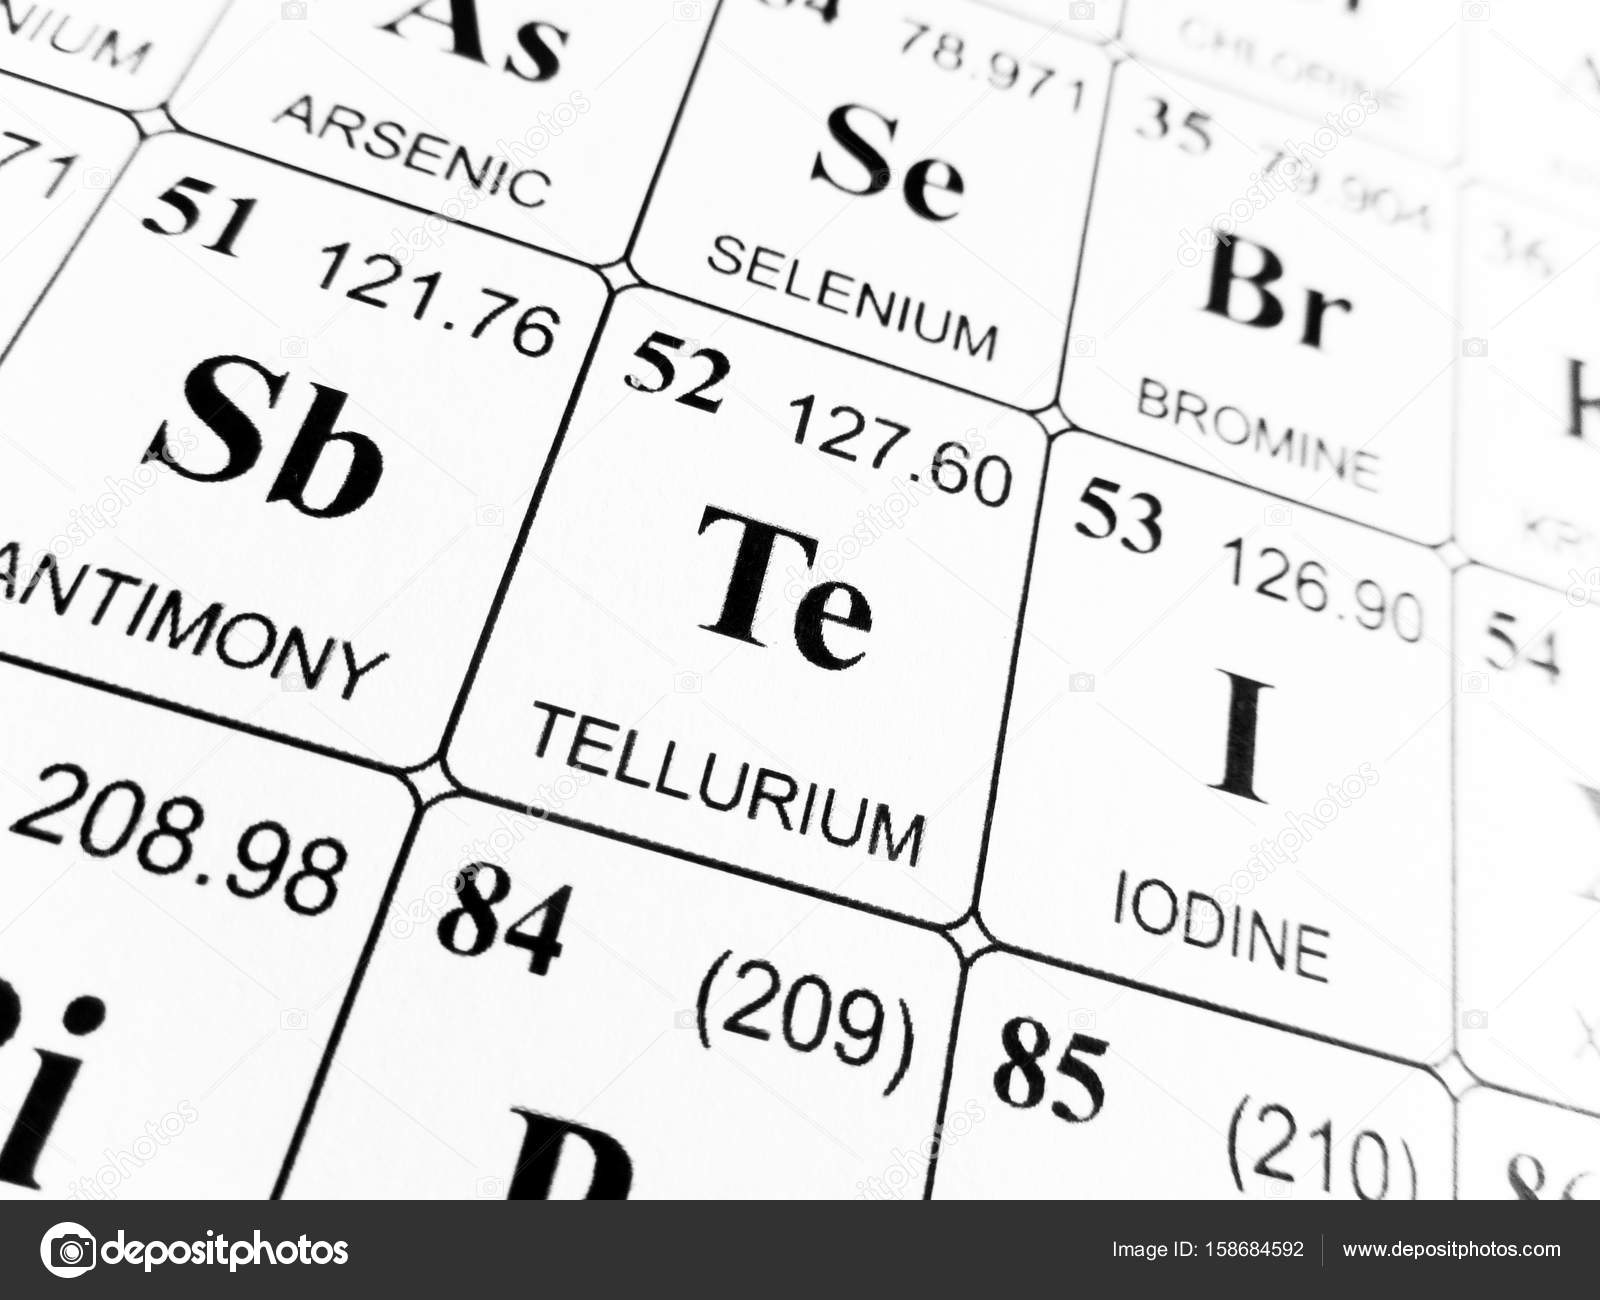 Tellurium on the periodic table of the elements stock photo tellurium on the periodic table of the elements stock photo urtaz Gallery